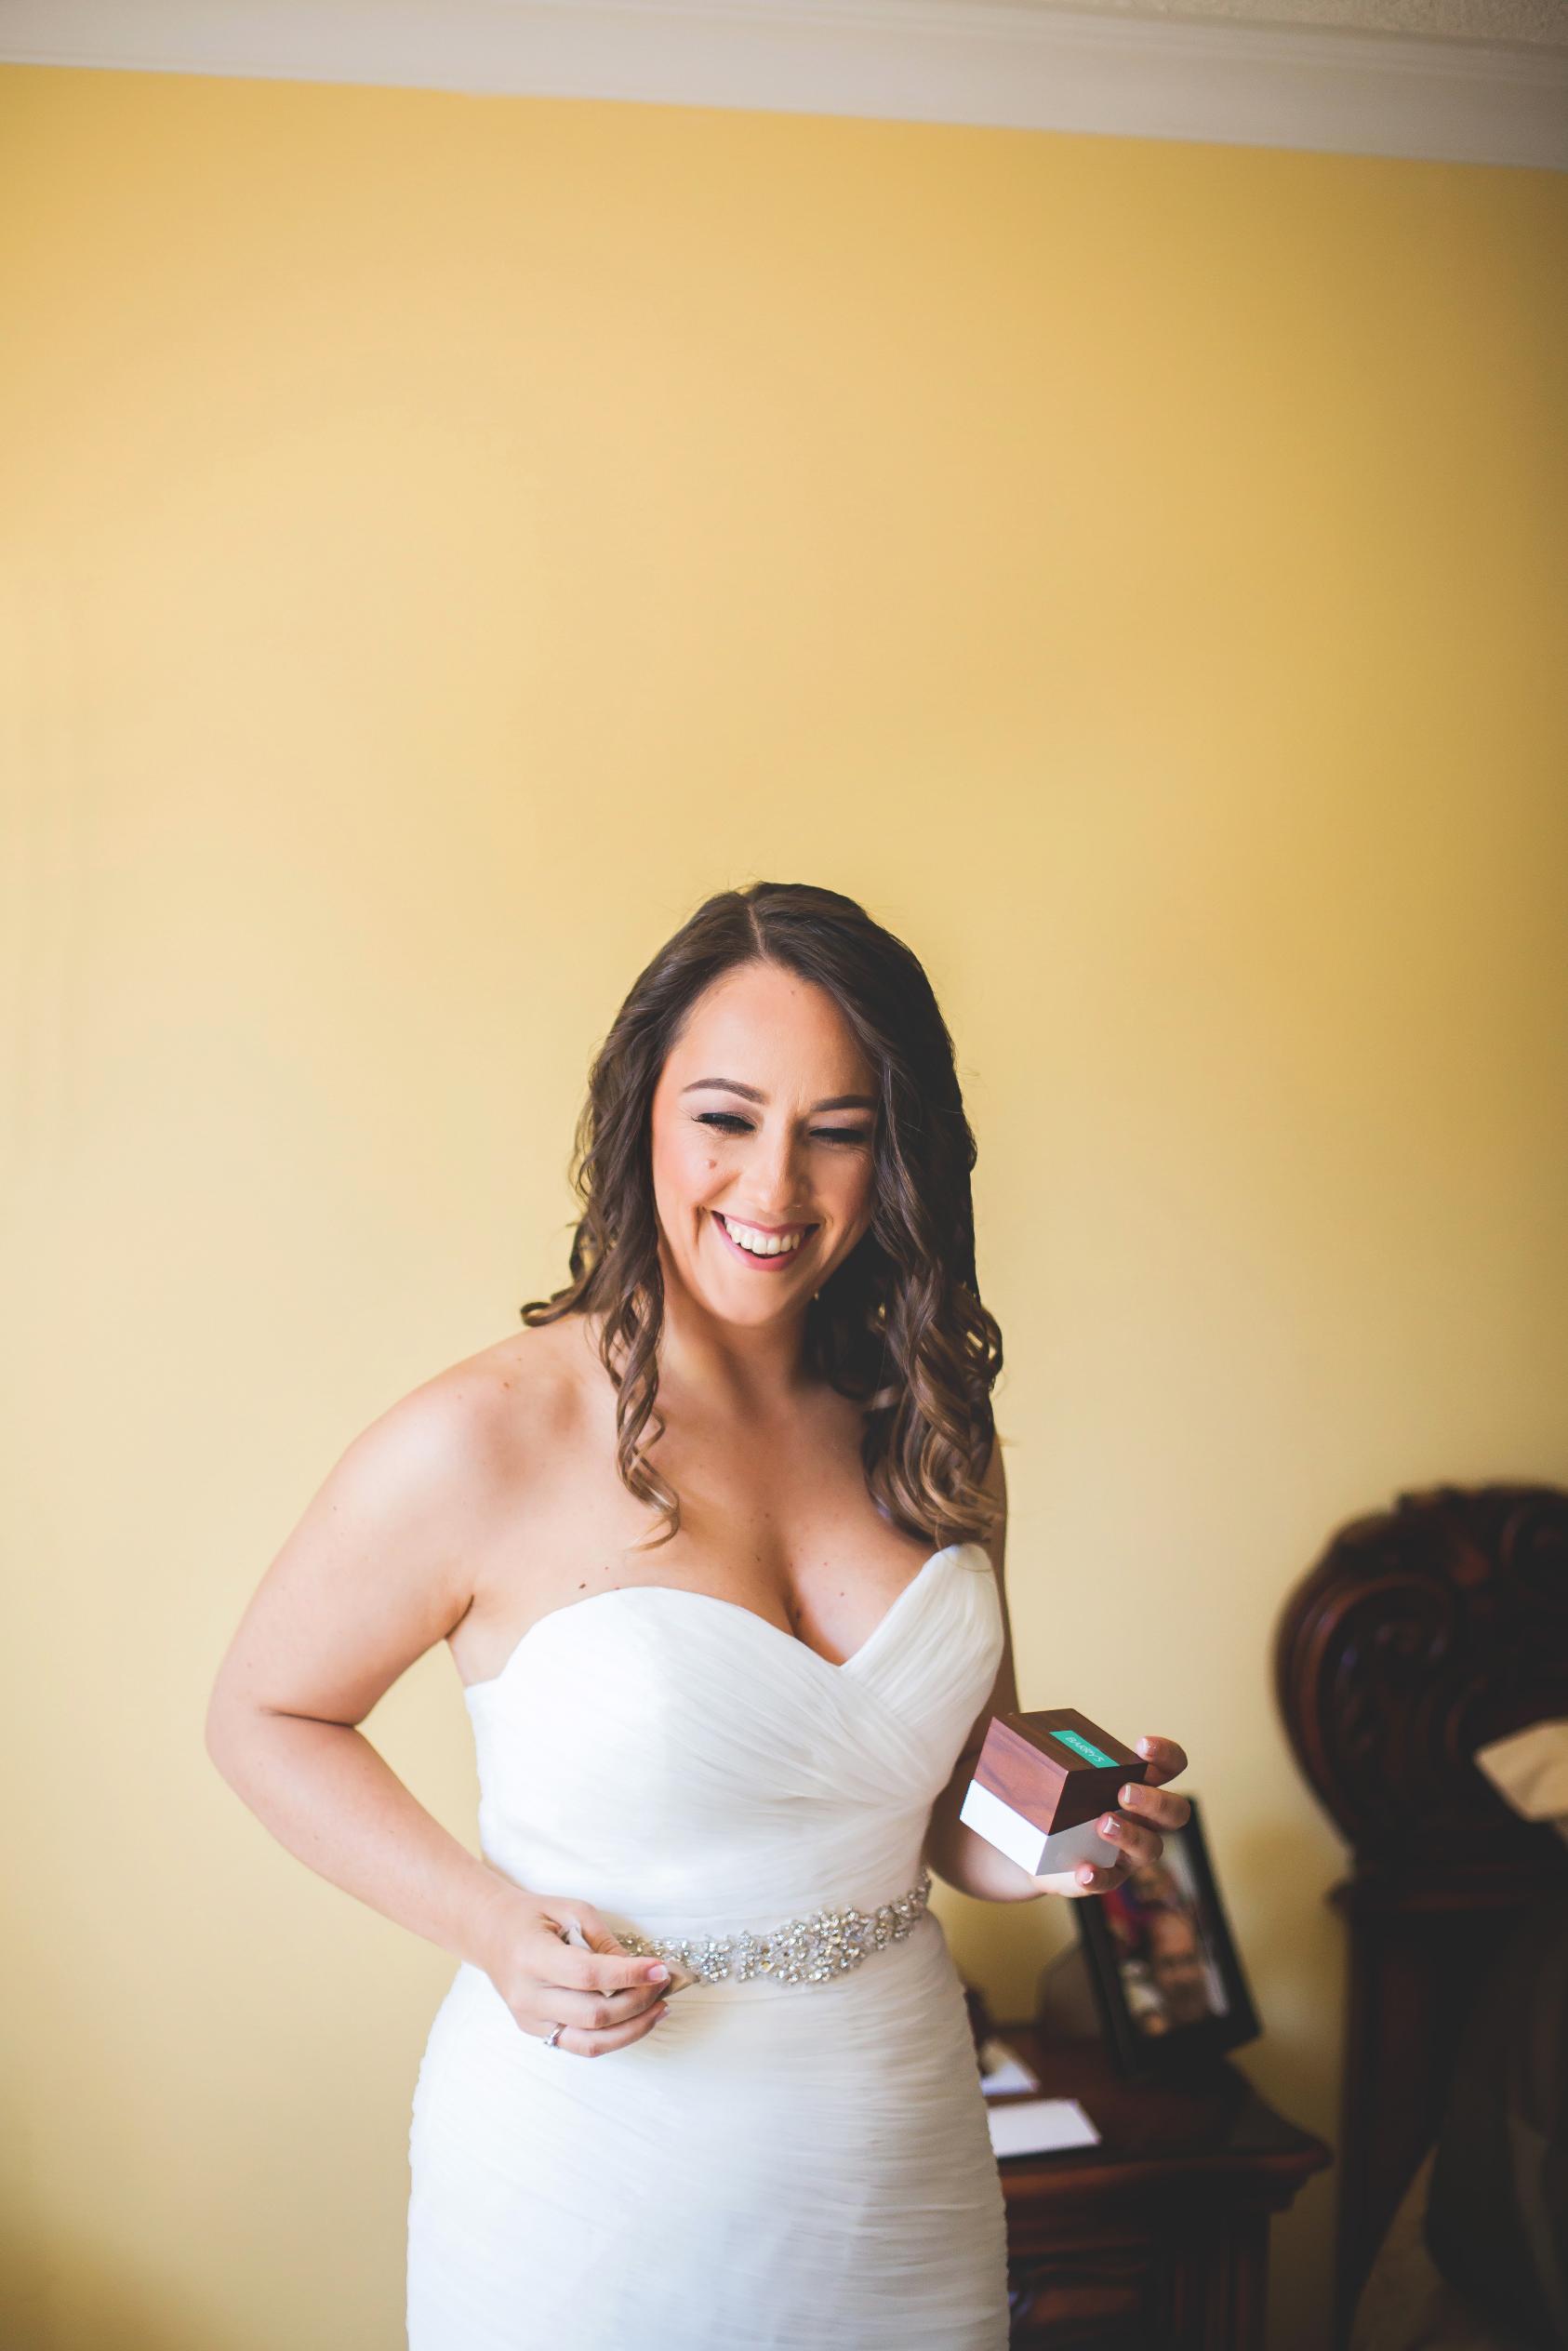 Wedding-Harbour-Banquet-Center-Oakville-Photographer-Wedding-Hamilton-Saint-James-Espresso-Downtown-HamOnt-GTA-Niagara-Toronto-Moments-by-Lauren-Photography-Photo-Image-4.png